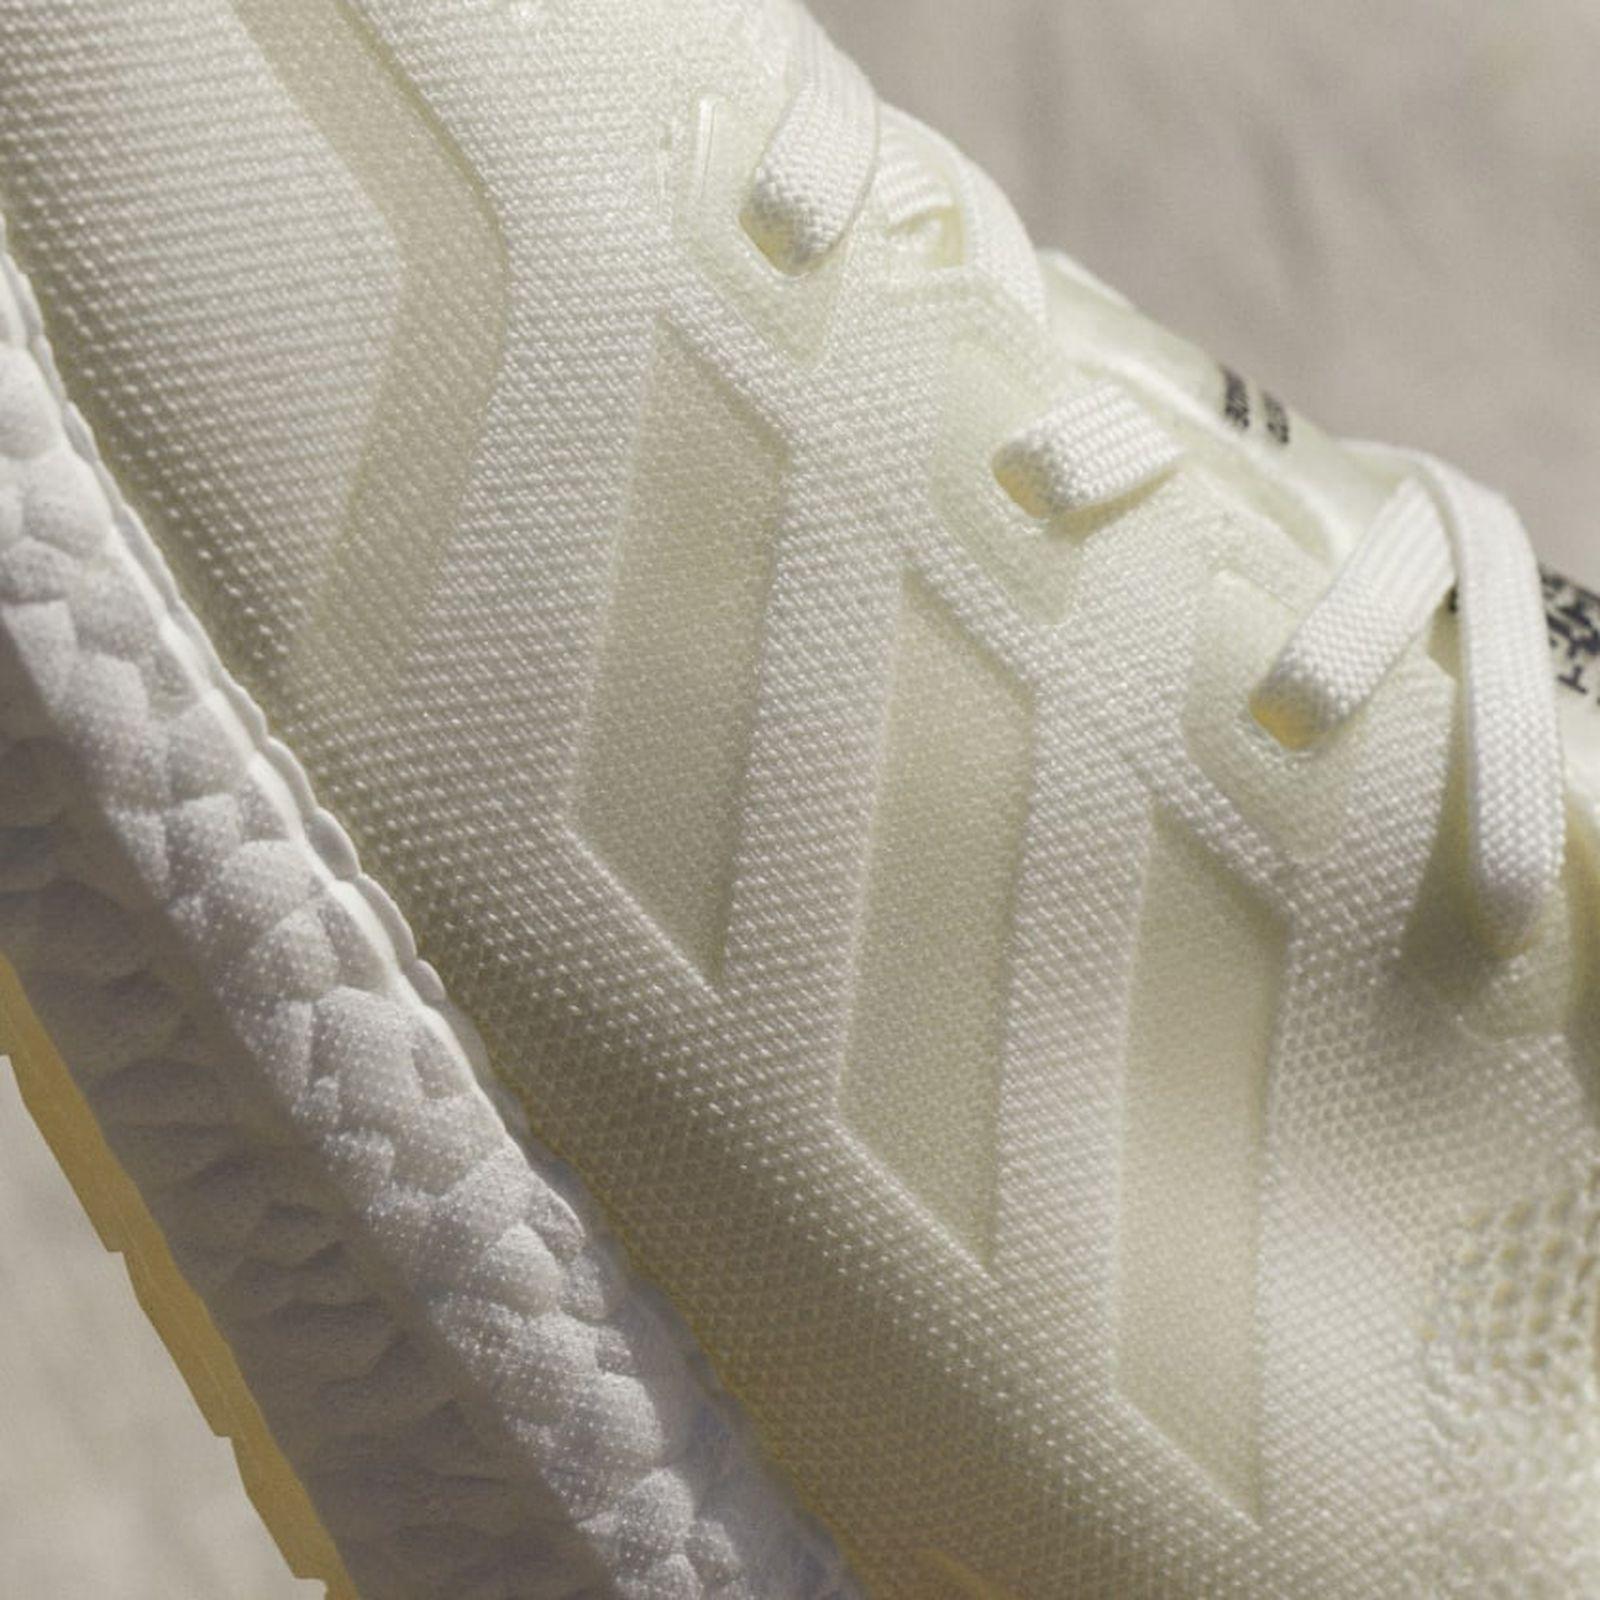 adidas-futurecraft-loop-release-date-price-02